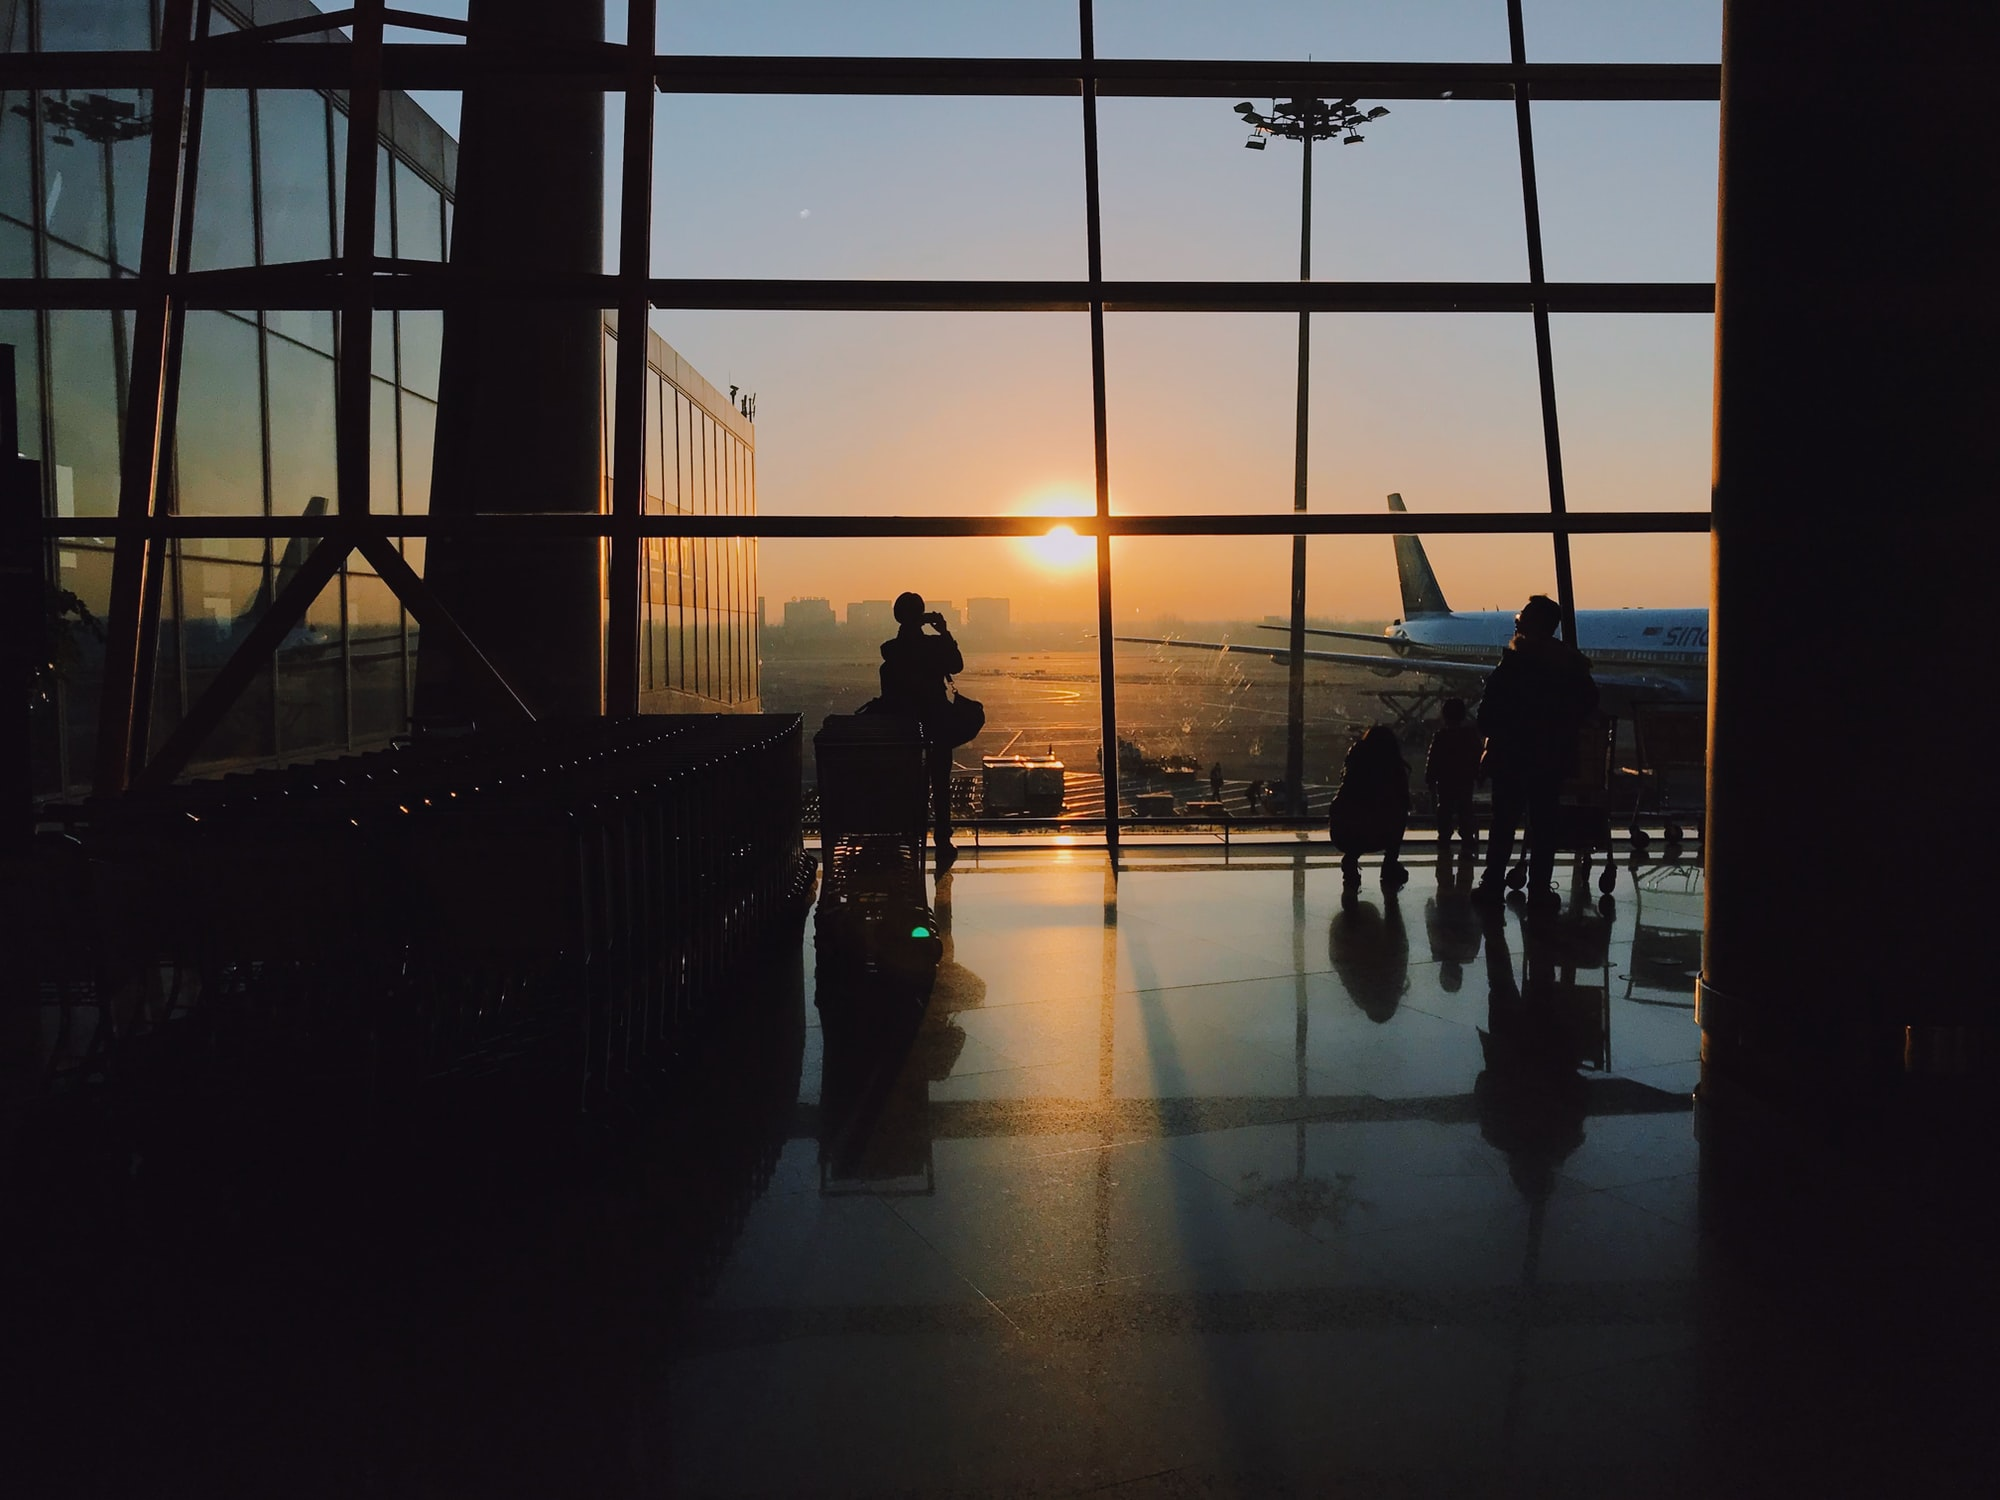 Passeport perdu aéroport - blog.troov.com